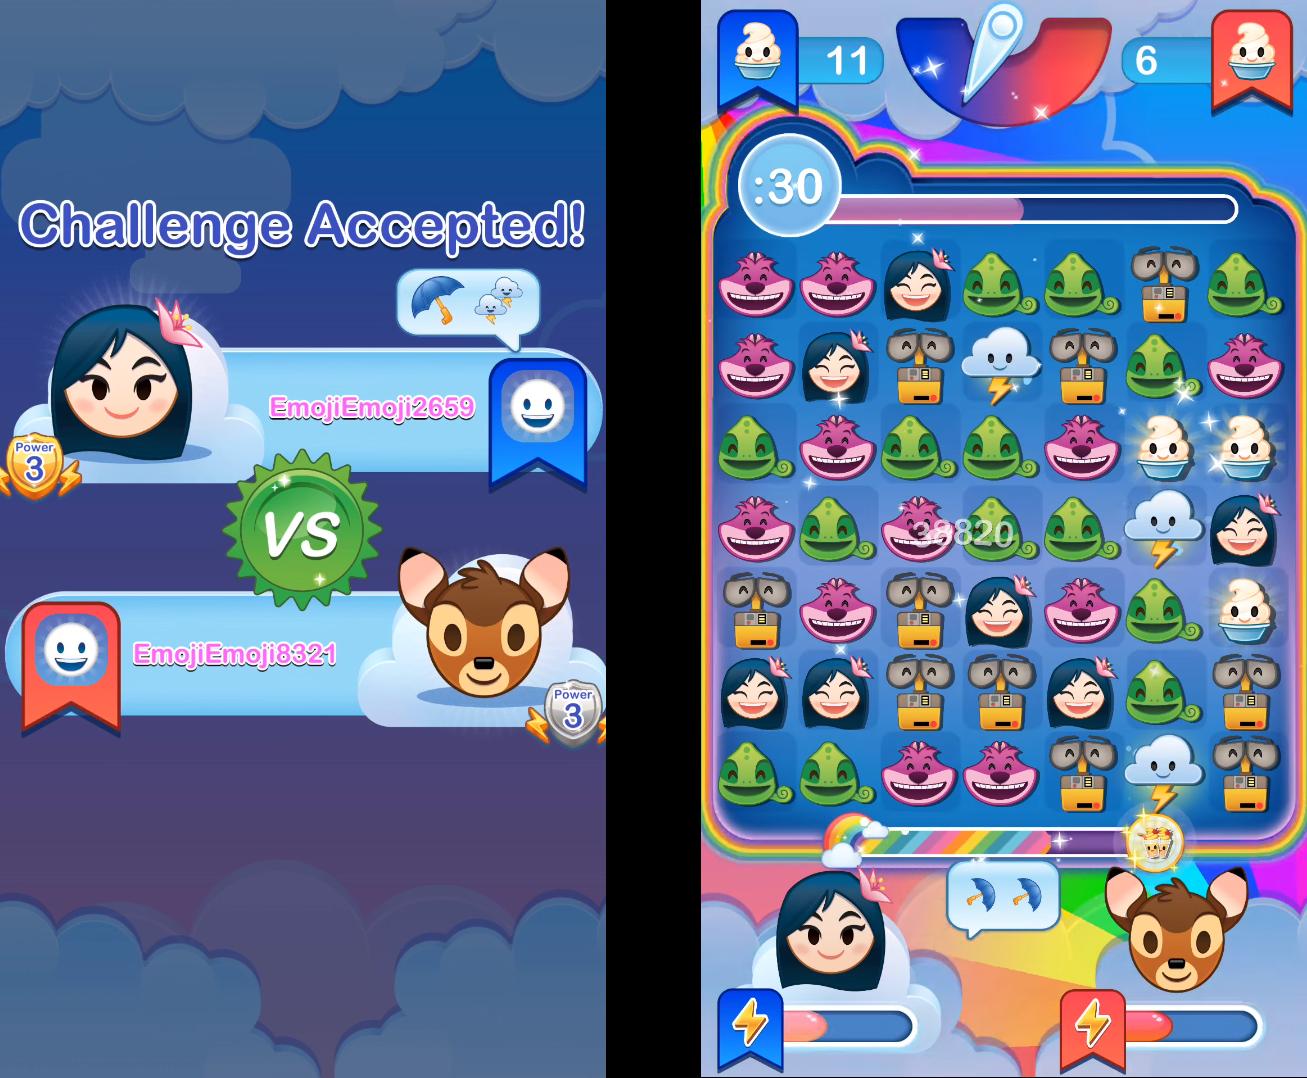 Food Fight Face-Off in Disney Emoji Blitz